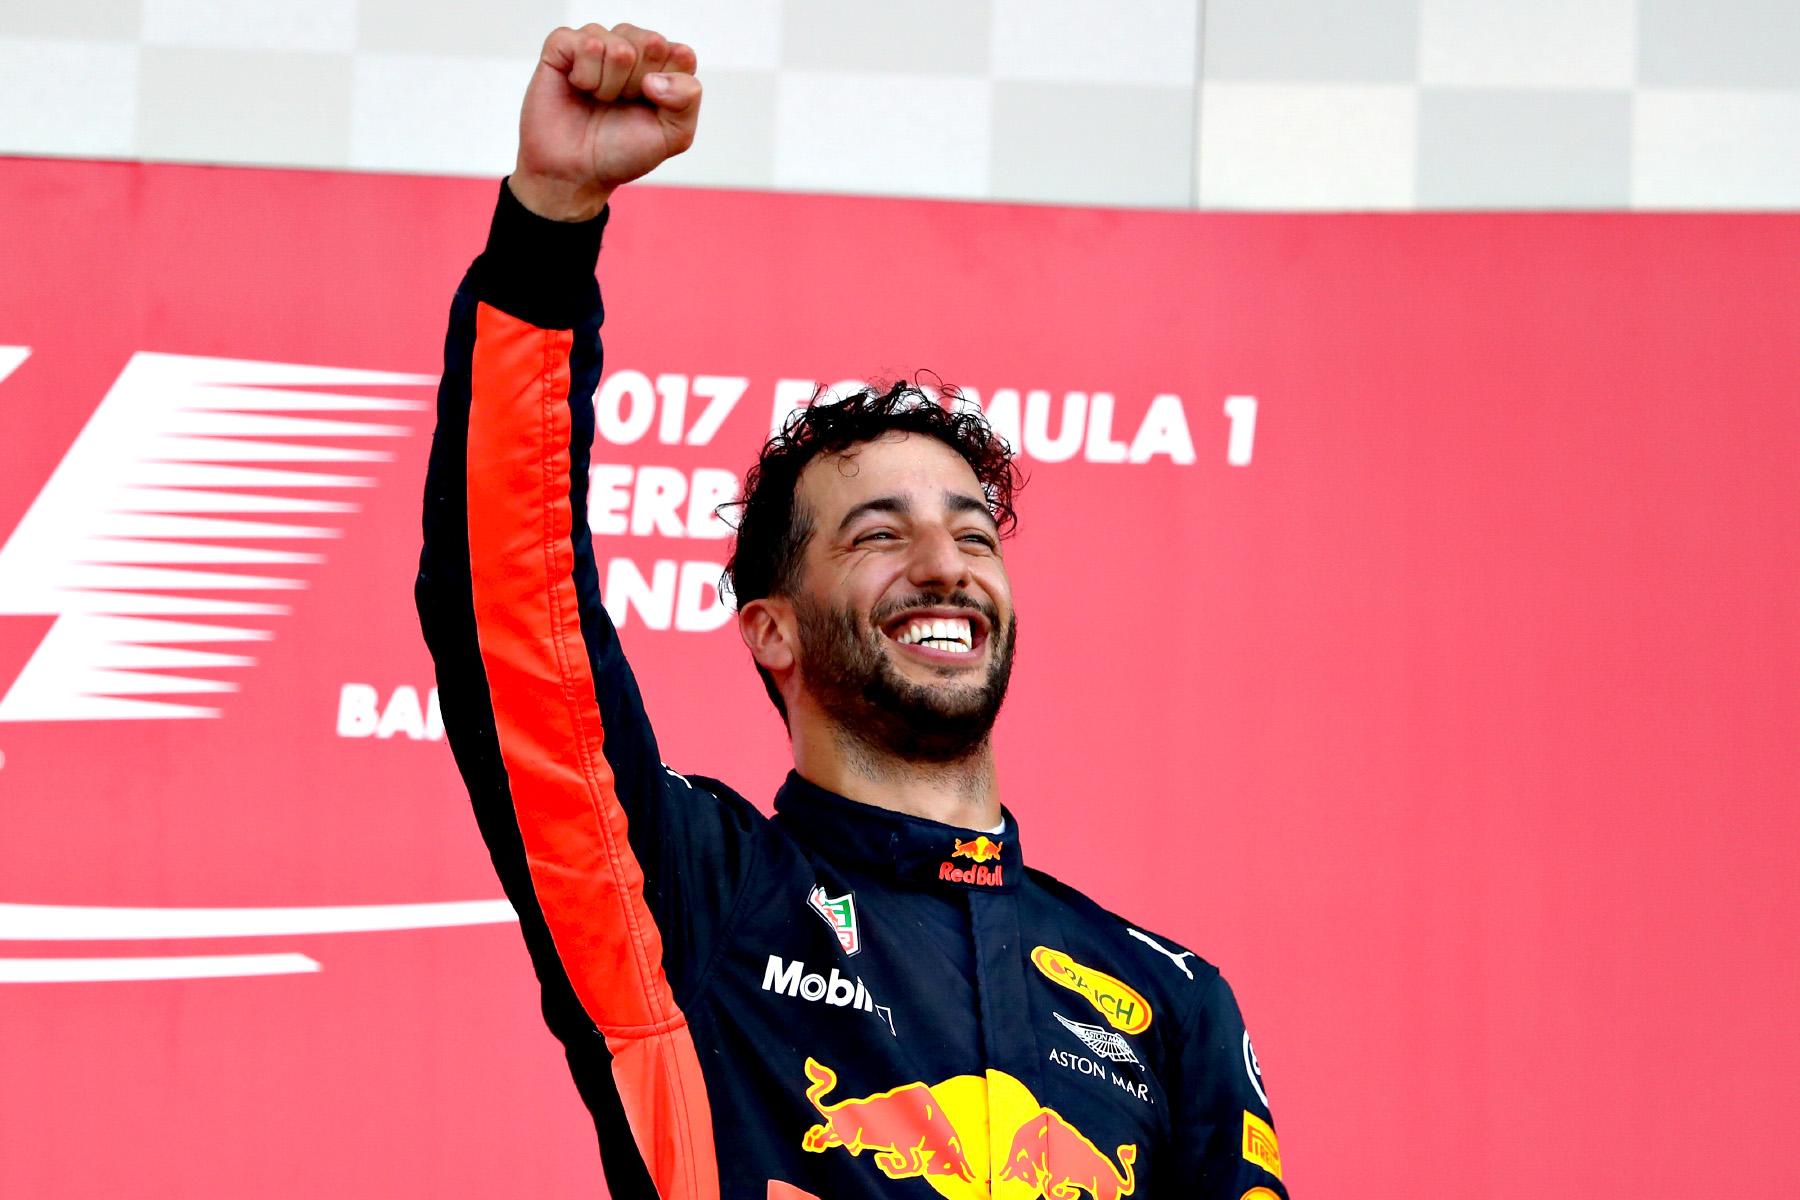 Daniel Ricciardo celebrates on the Azerbaijan Grand Prix podium